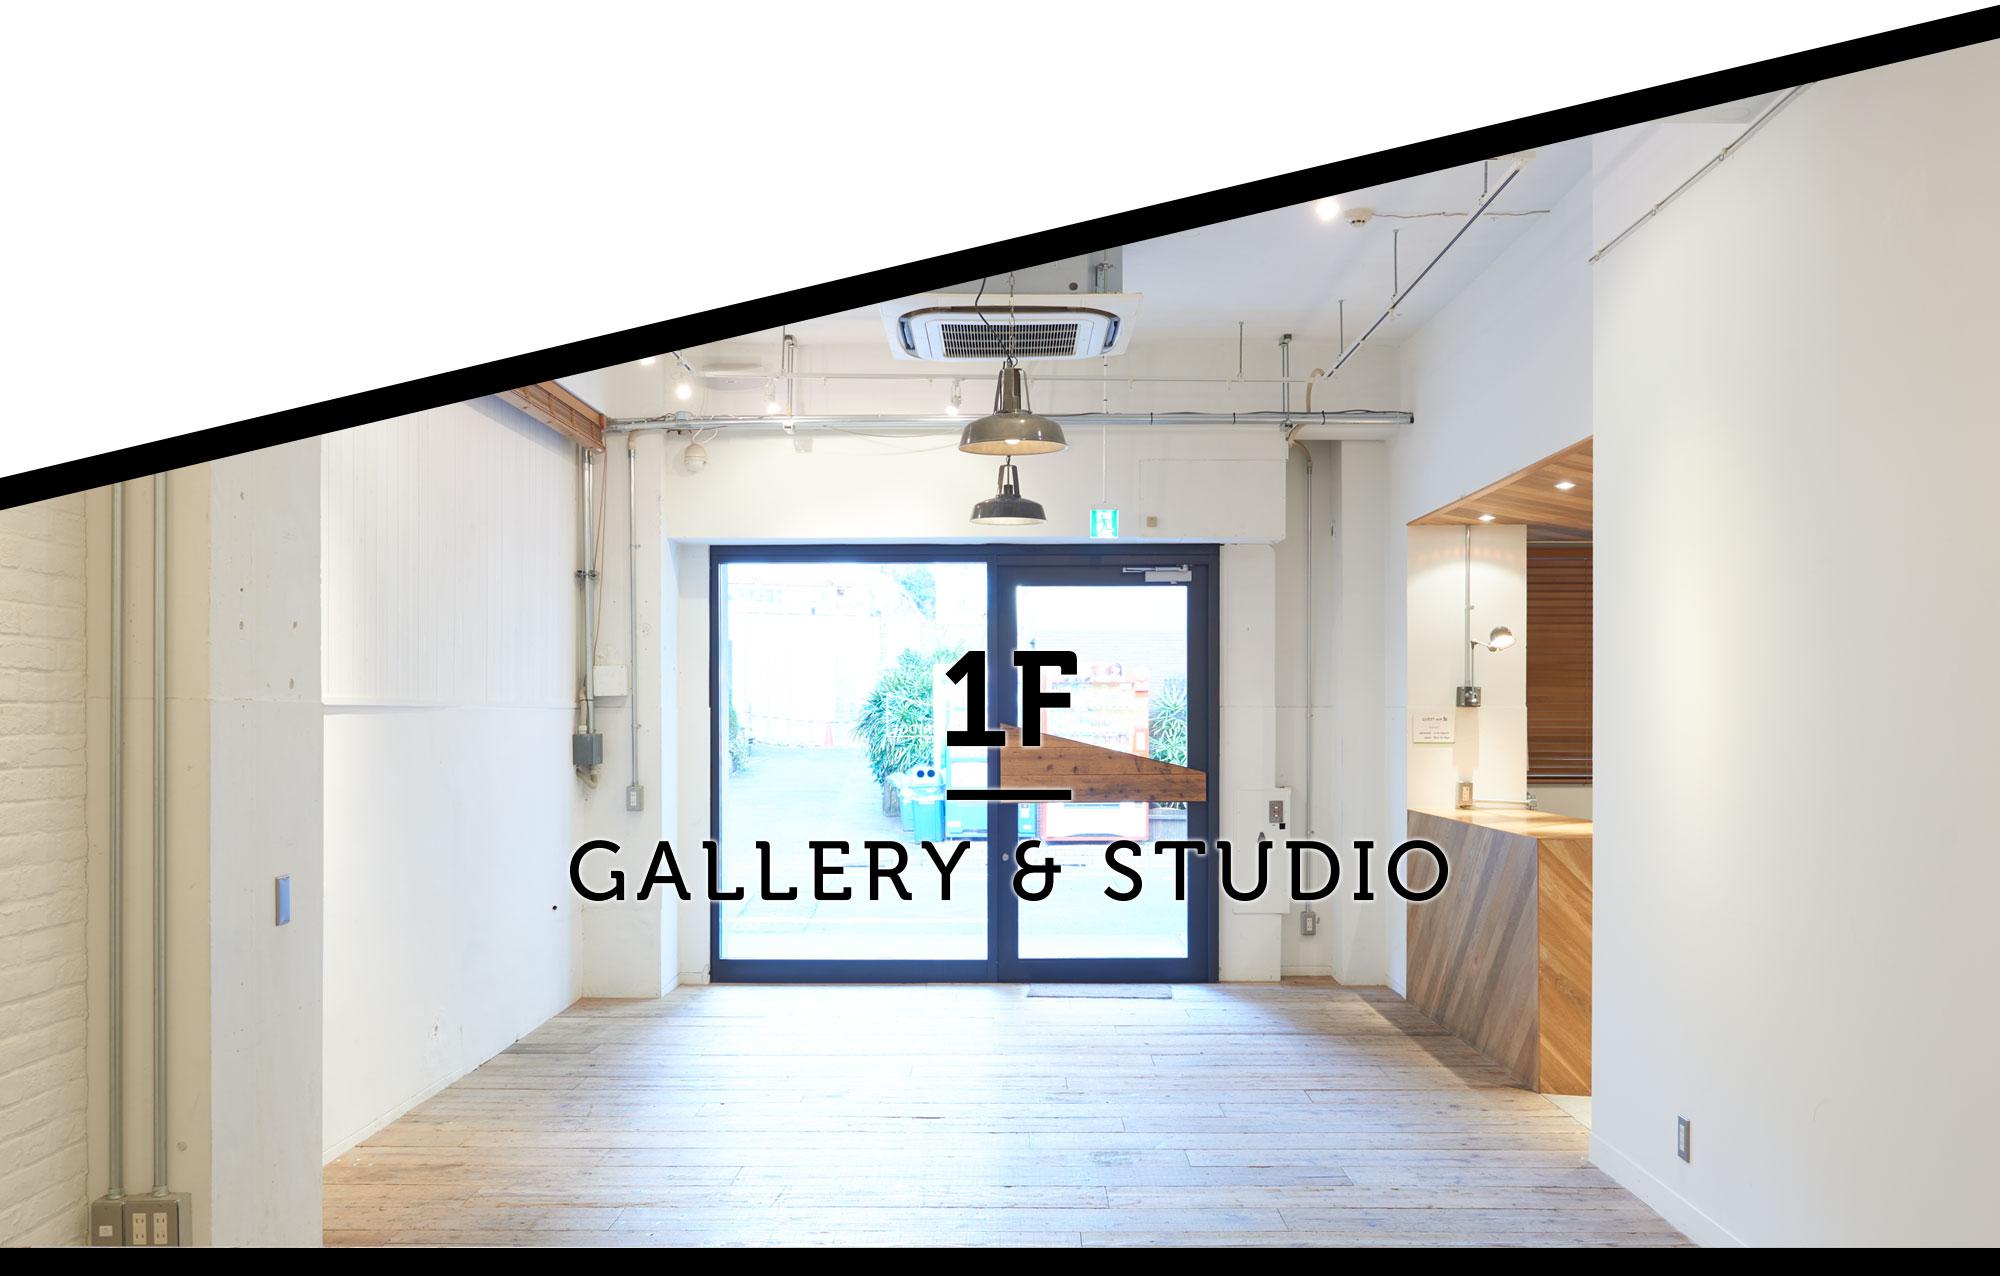 1F GALLERY & STUDIO